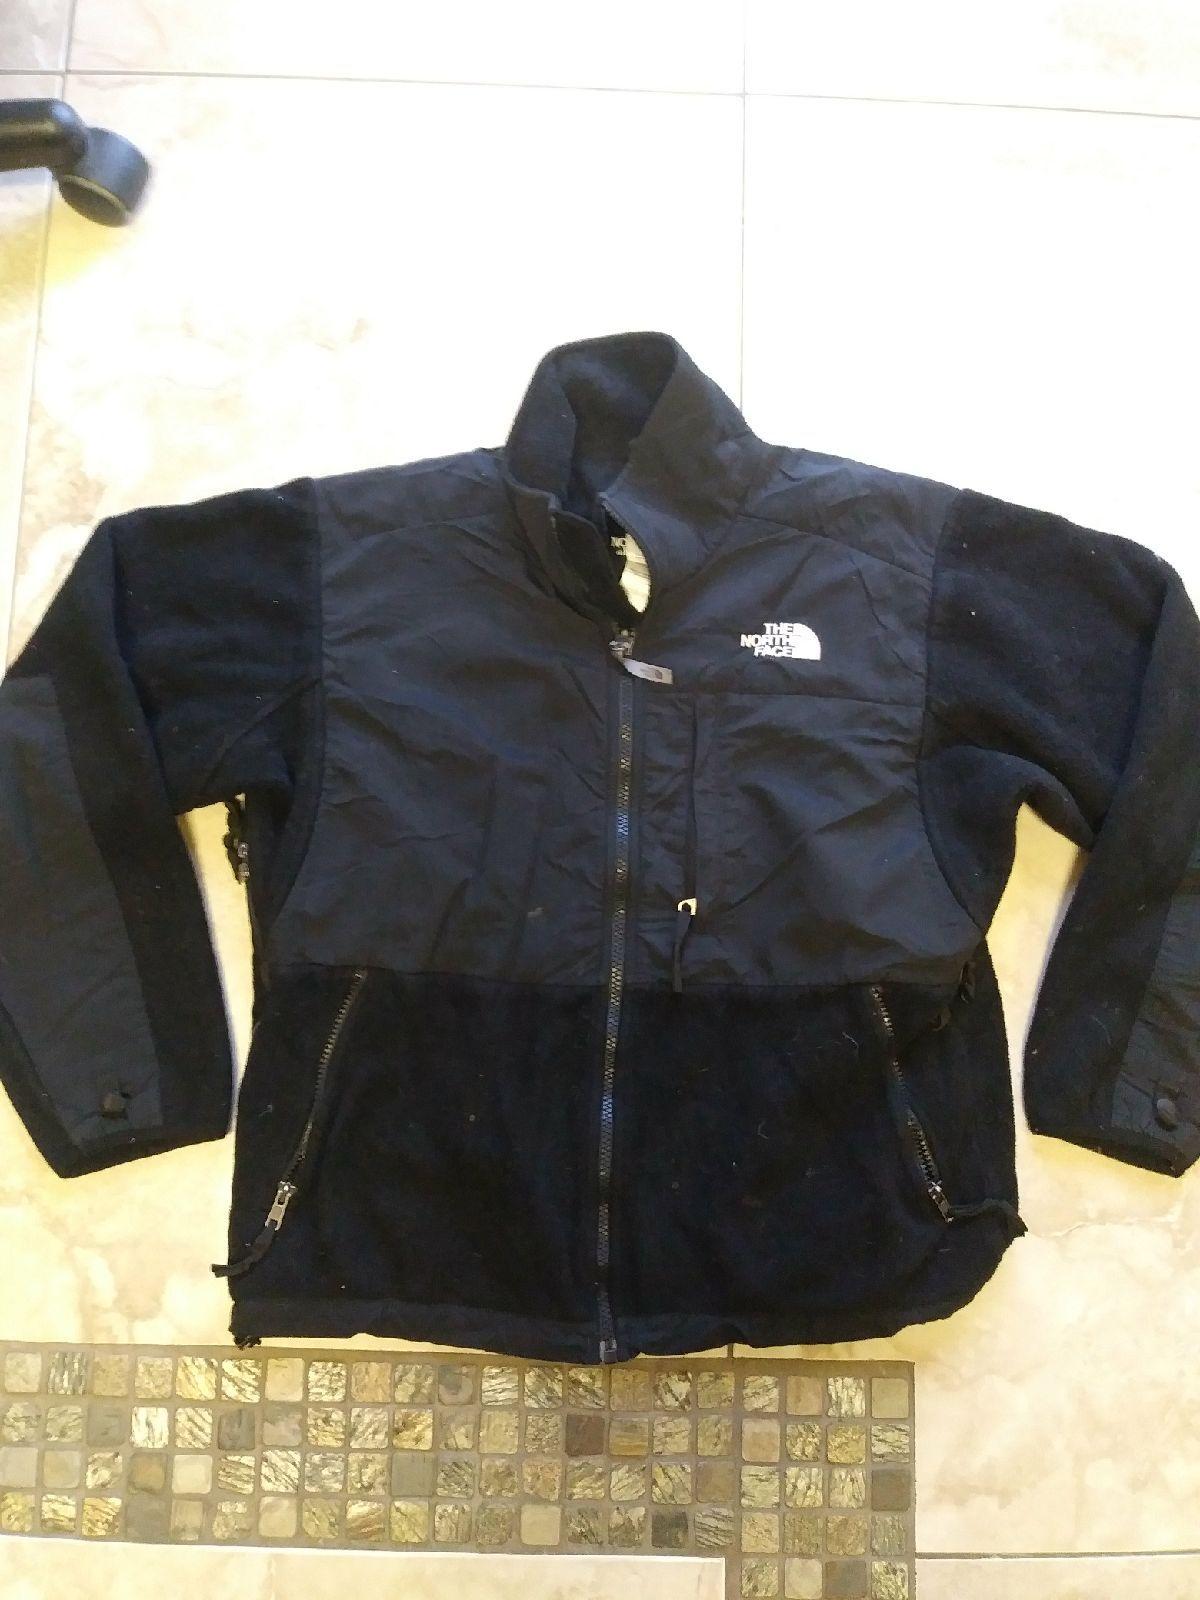 Black The North Face Denali Jacket Needs Washing North Face Jacket Womens North Face Jacket The North Face [ 1600 x 1200 Pixel ]